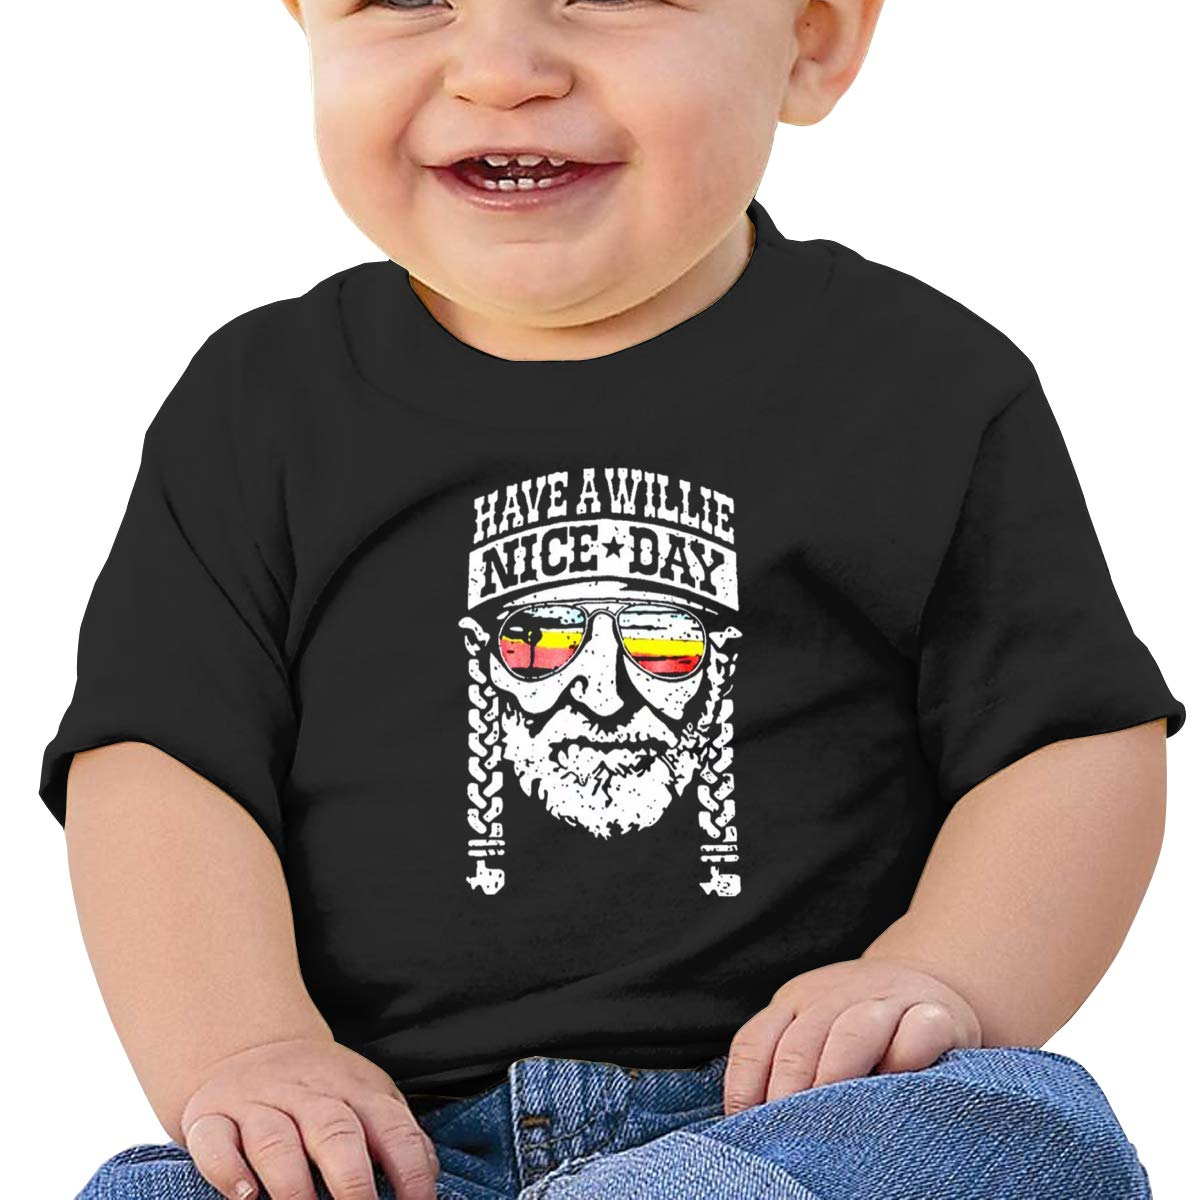 Willie Tee  Baby  Kids  adults Unisex Tee